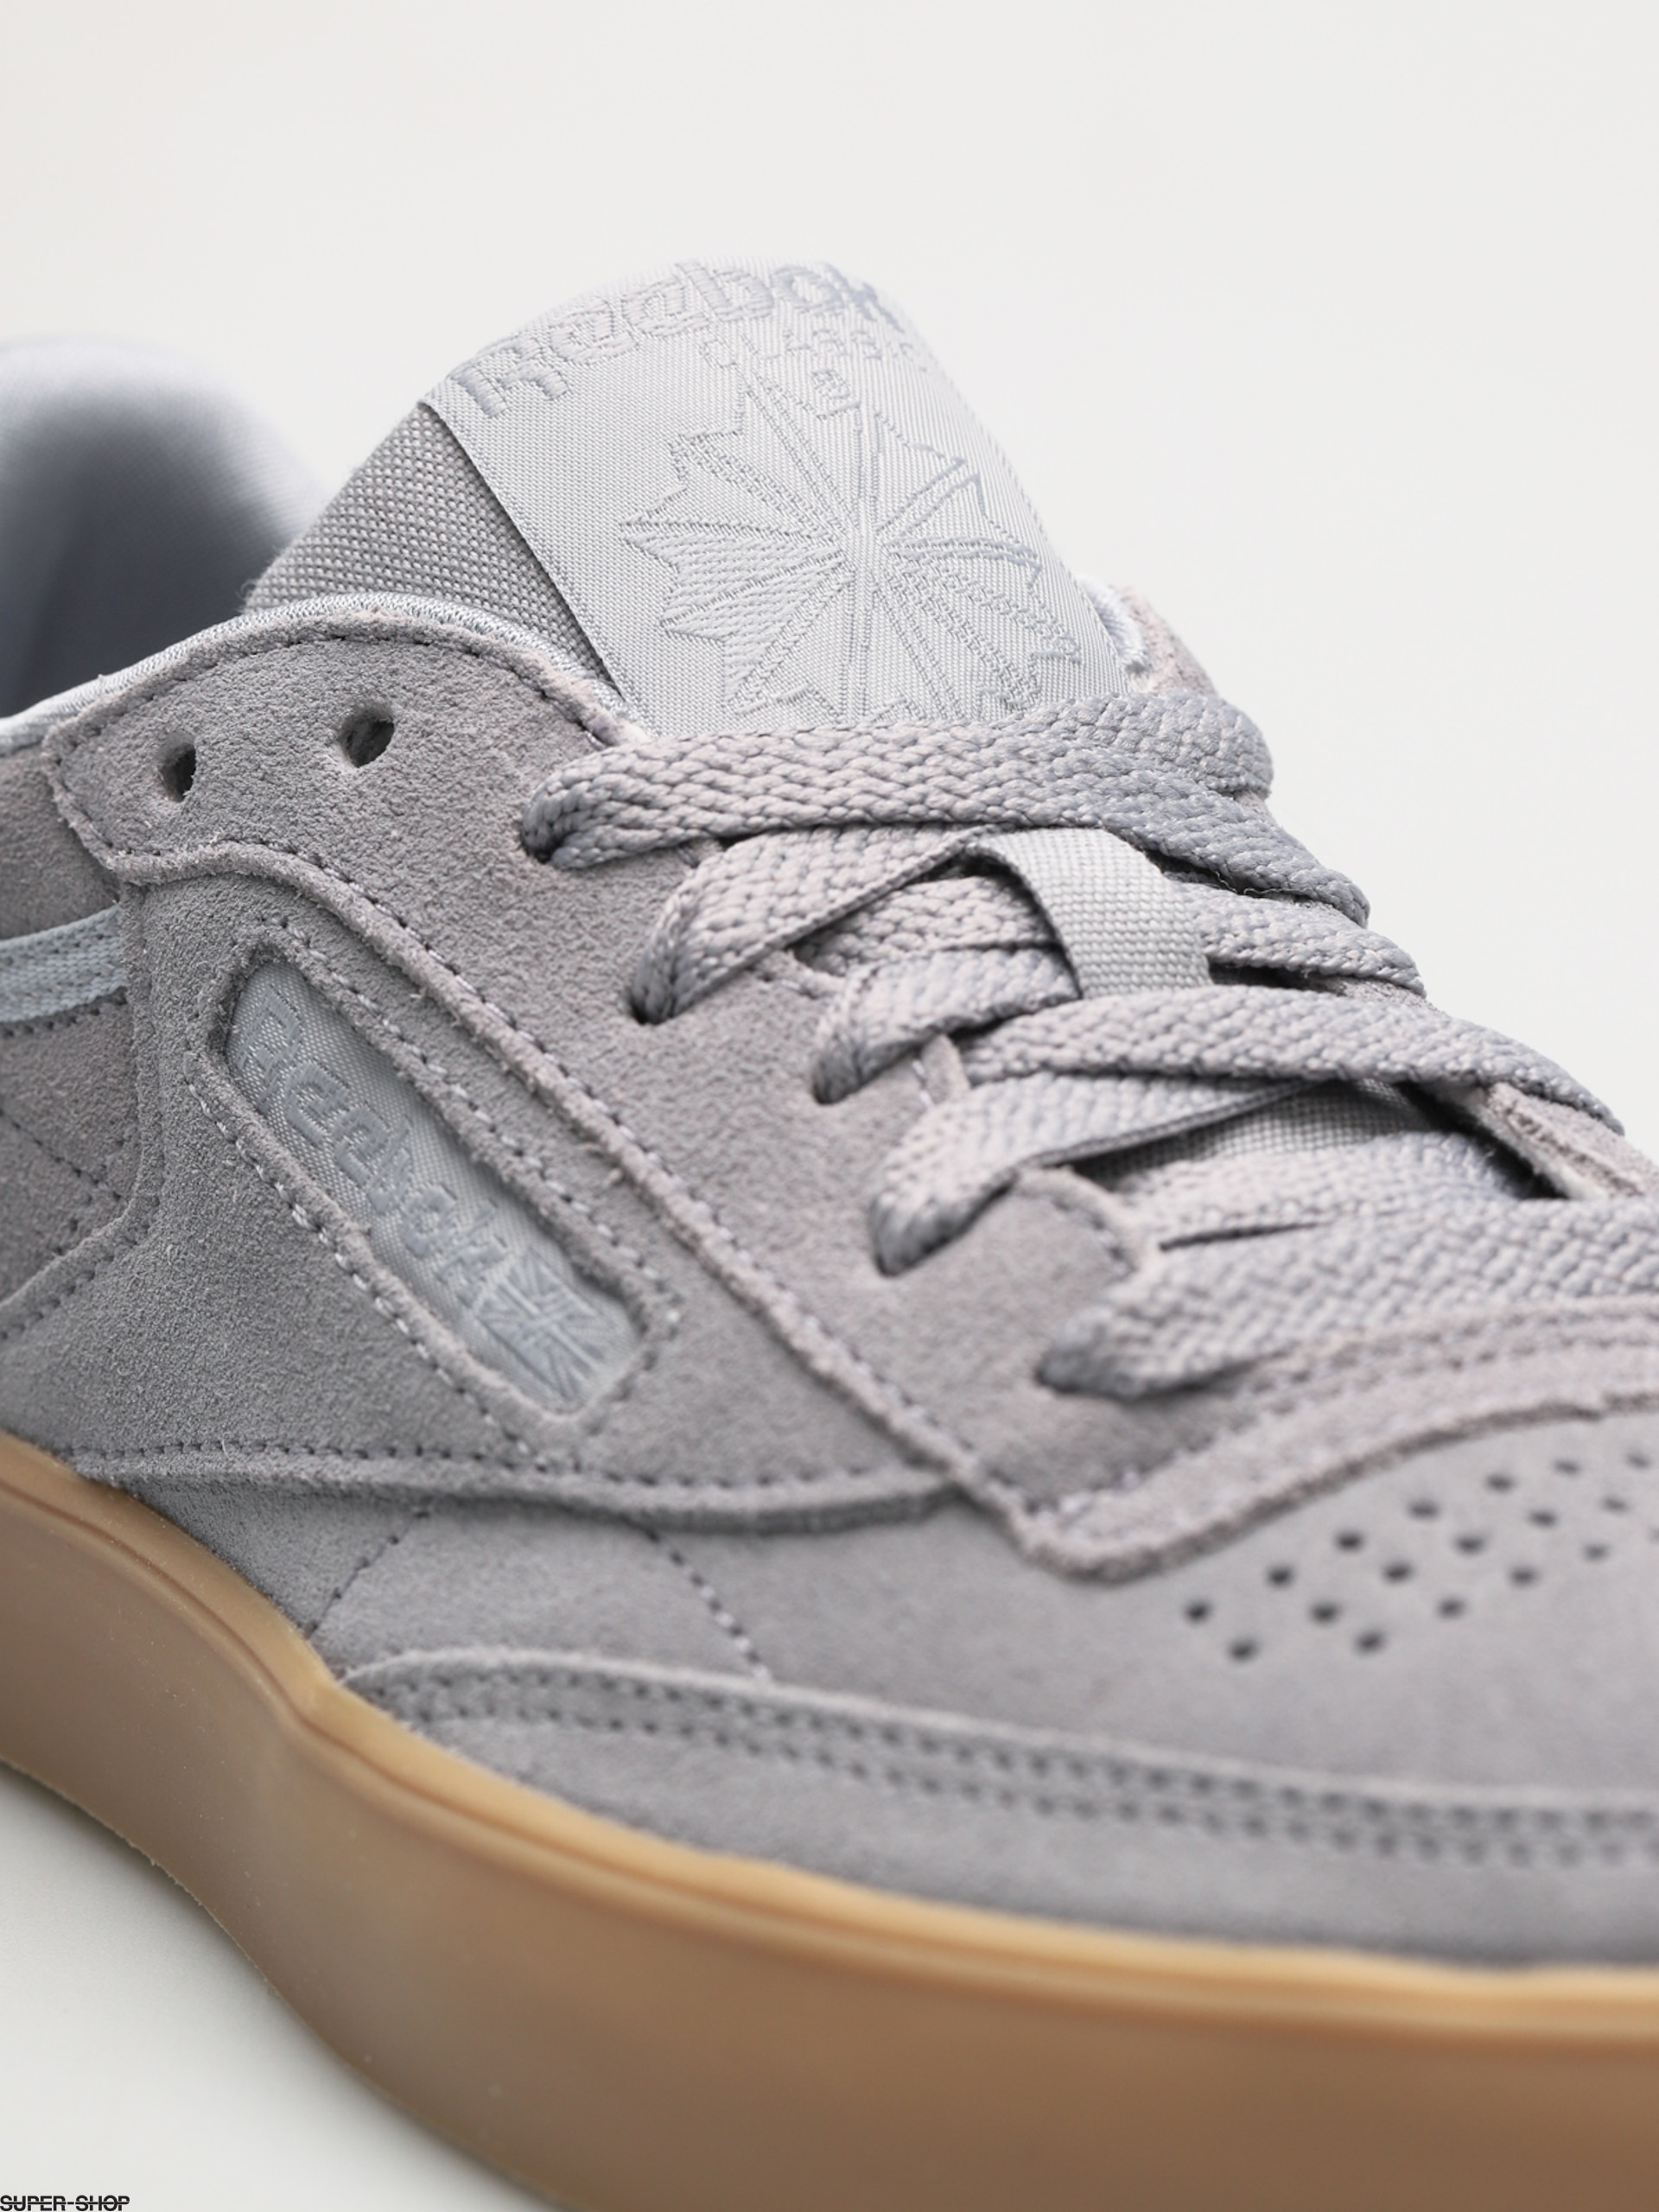 Reebok Shoes Club C 85 Fvs Wmn (gum